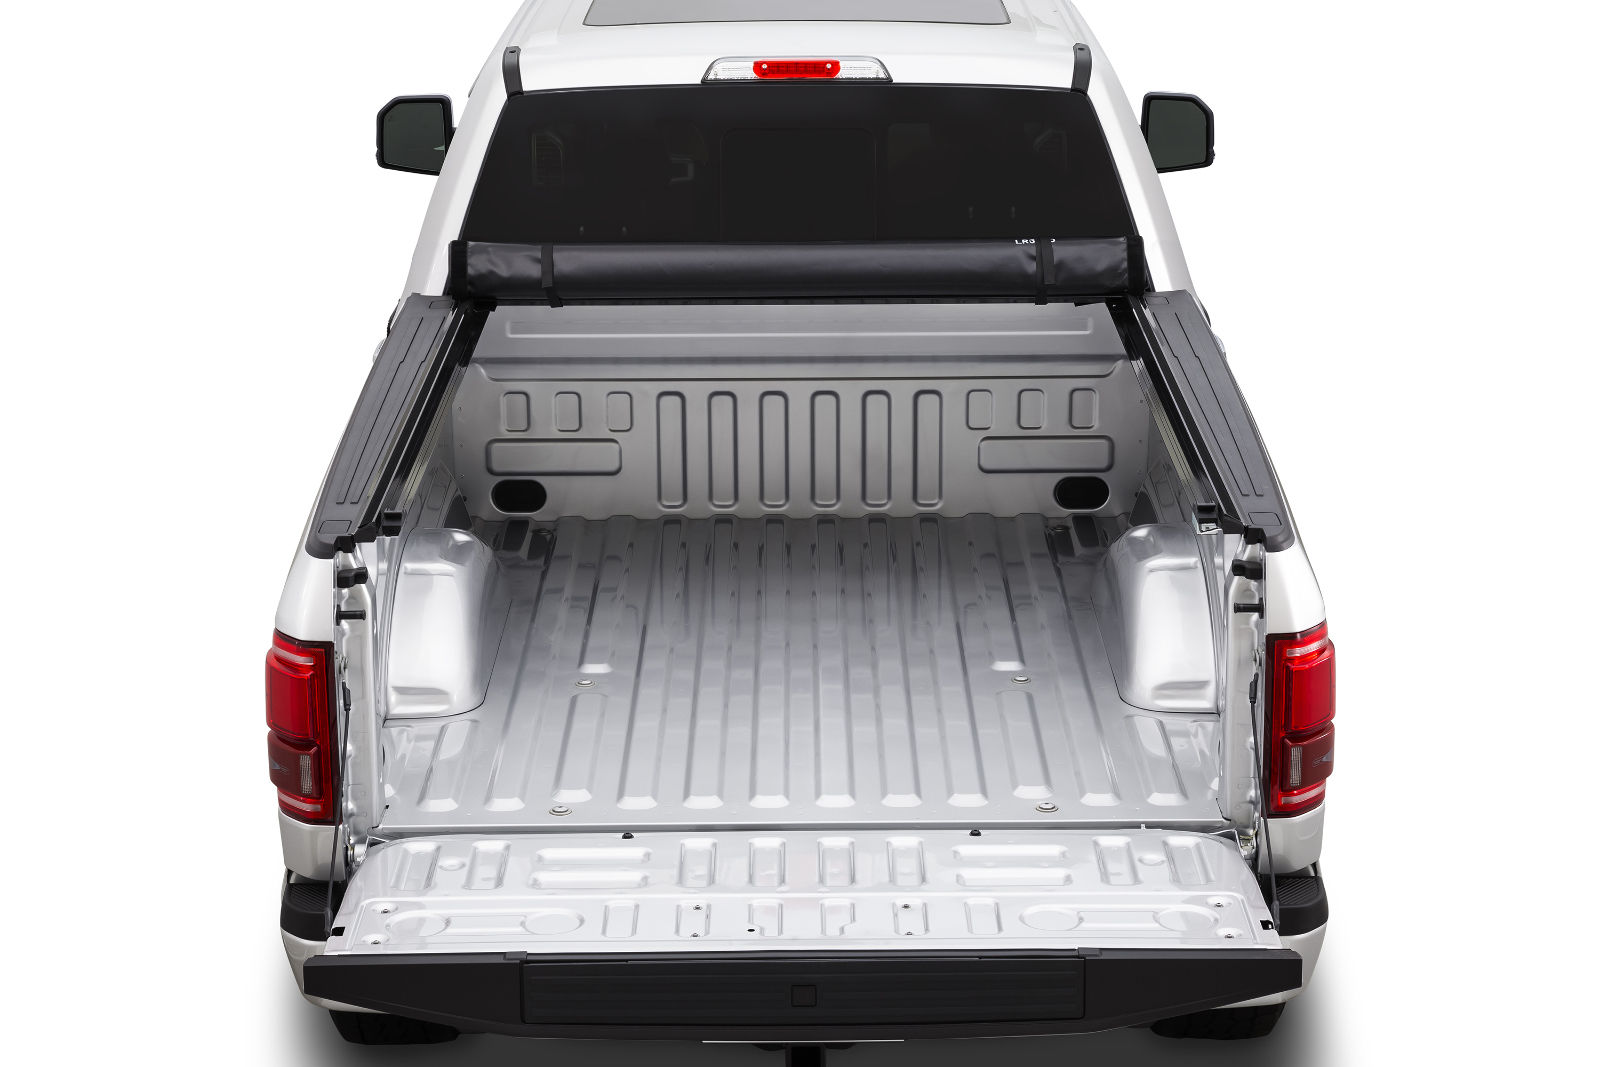 Tonno Pro Lr 1005 Loroll Rollup Tonneau Cover Auto Parts Accessories Truck Bed Accessories